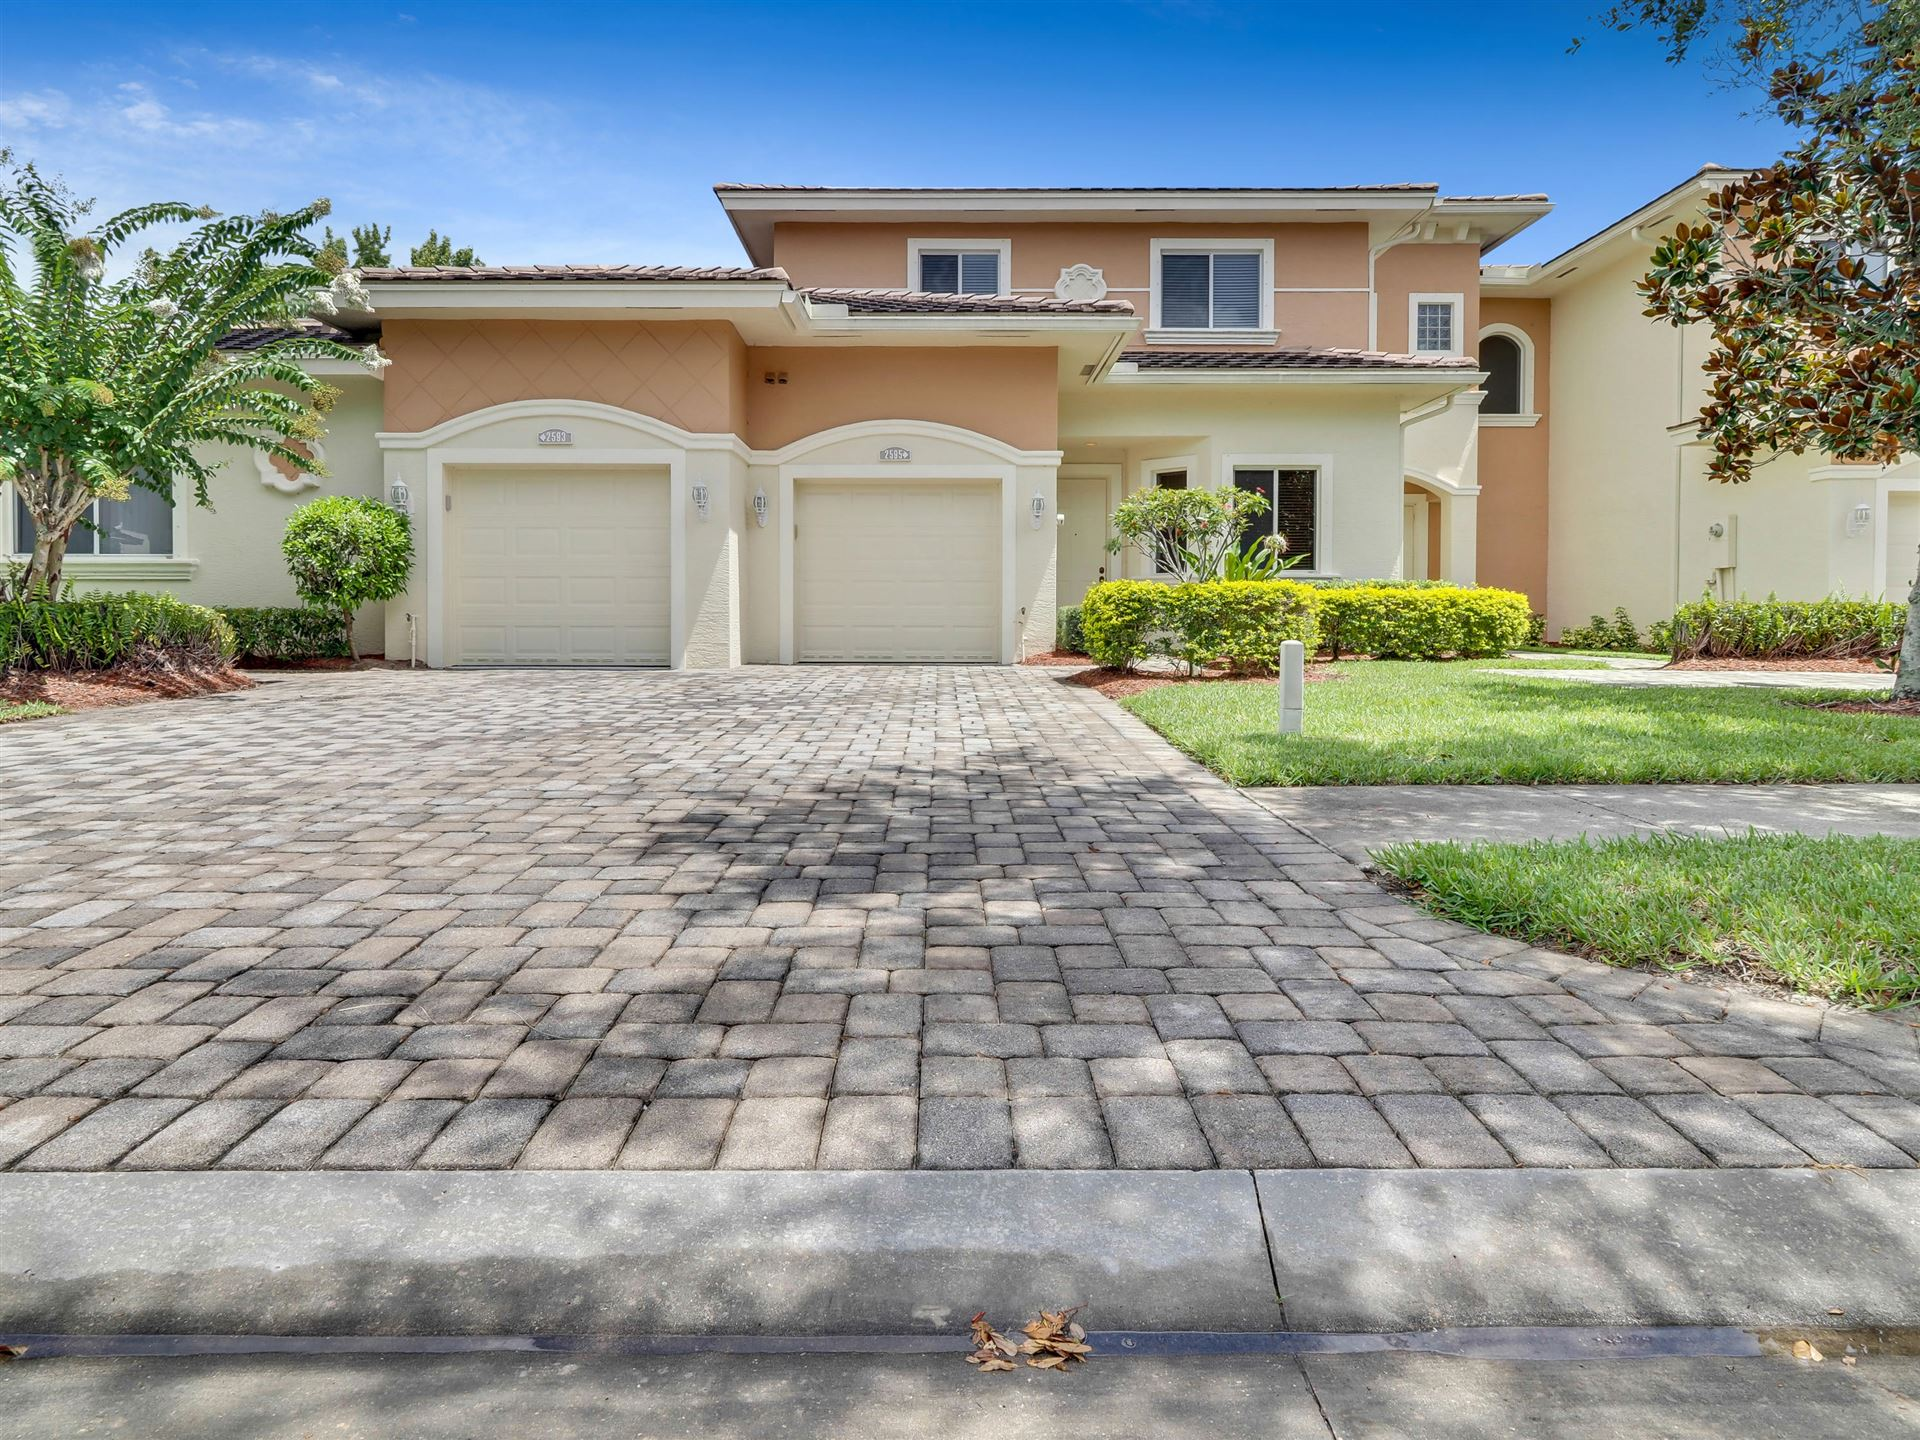 2595 Stockbridge Square SW, Vero Beach, FL 32962 - #: RX-10641272